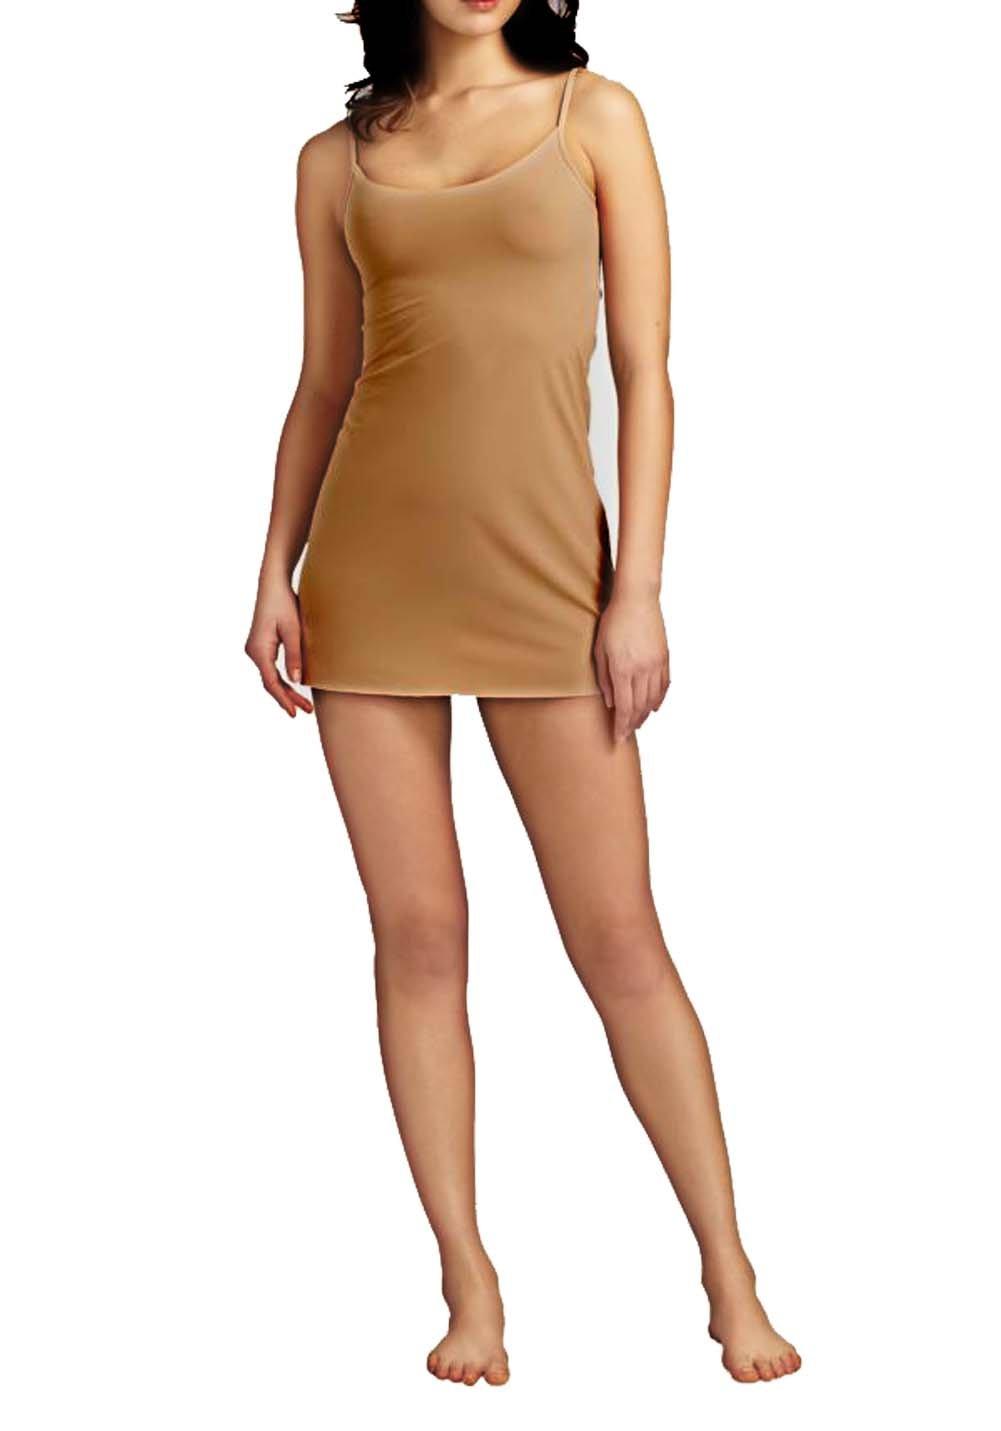 commando Women's Mini Cami Slip